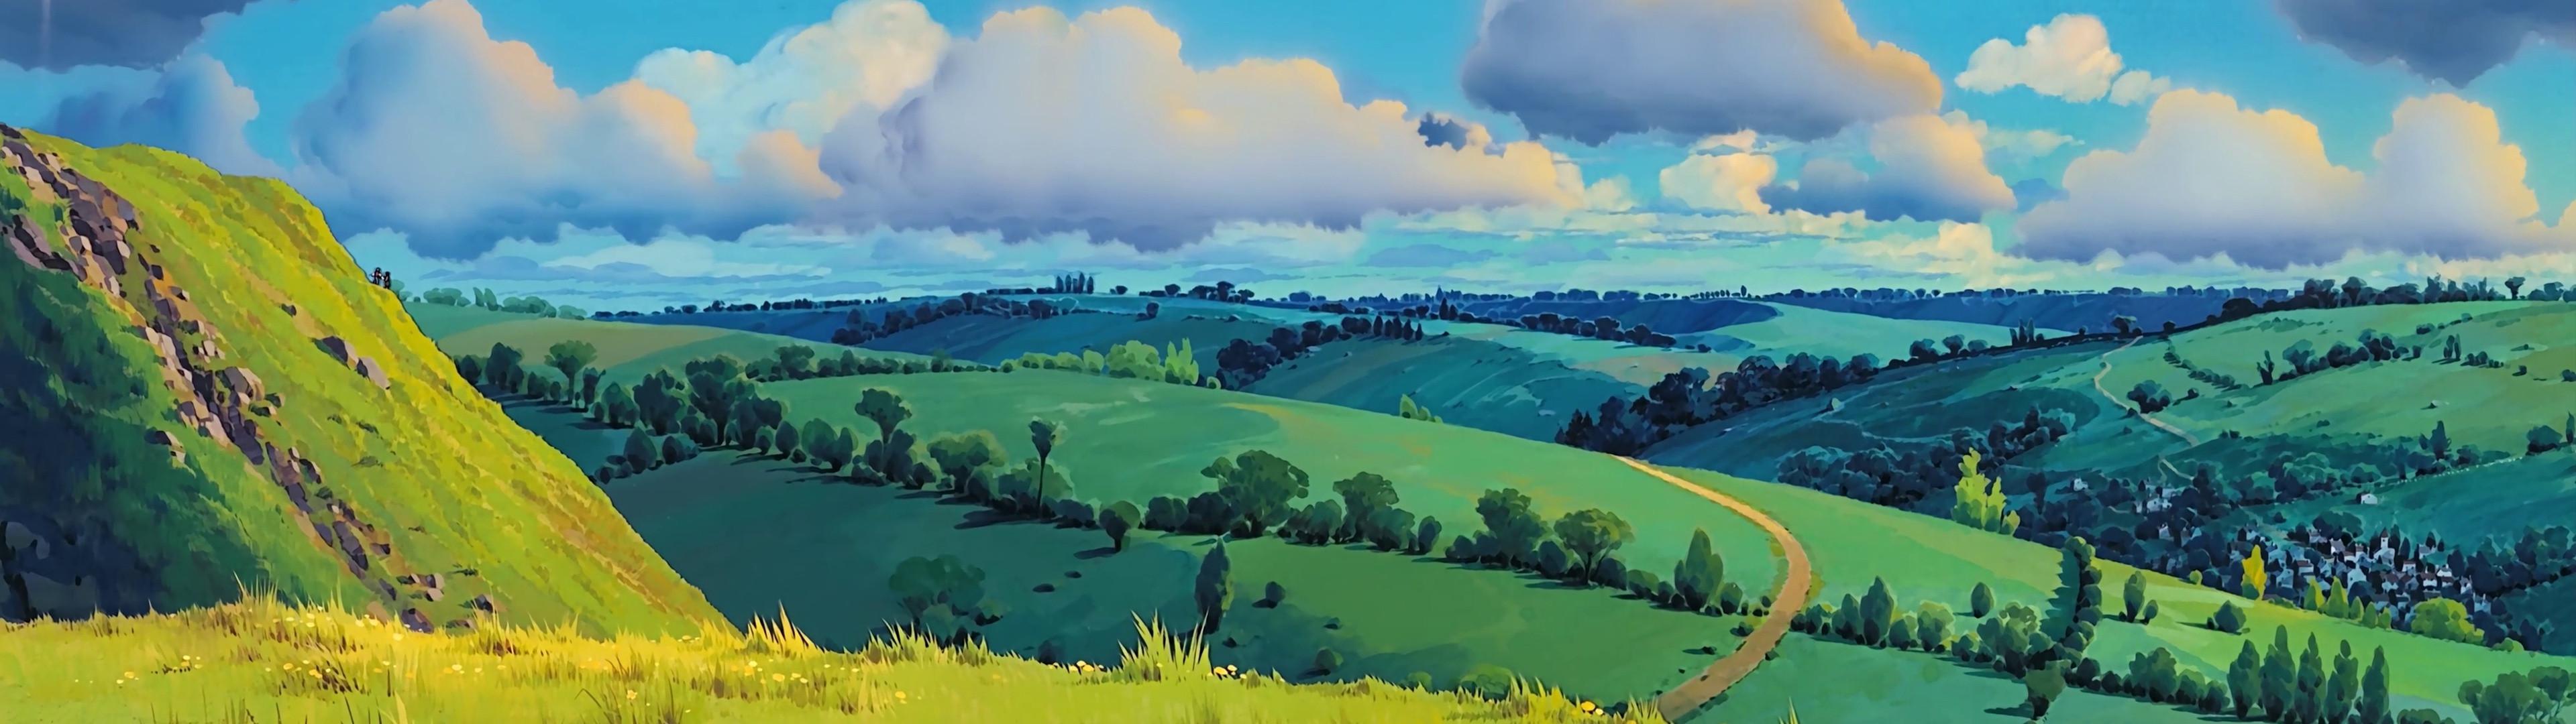 Studio Ghibli Wallpapers (71+ images)